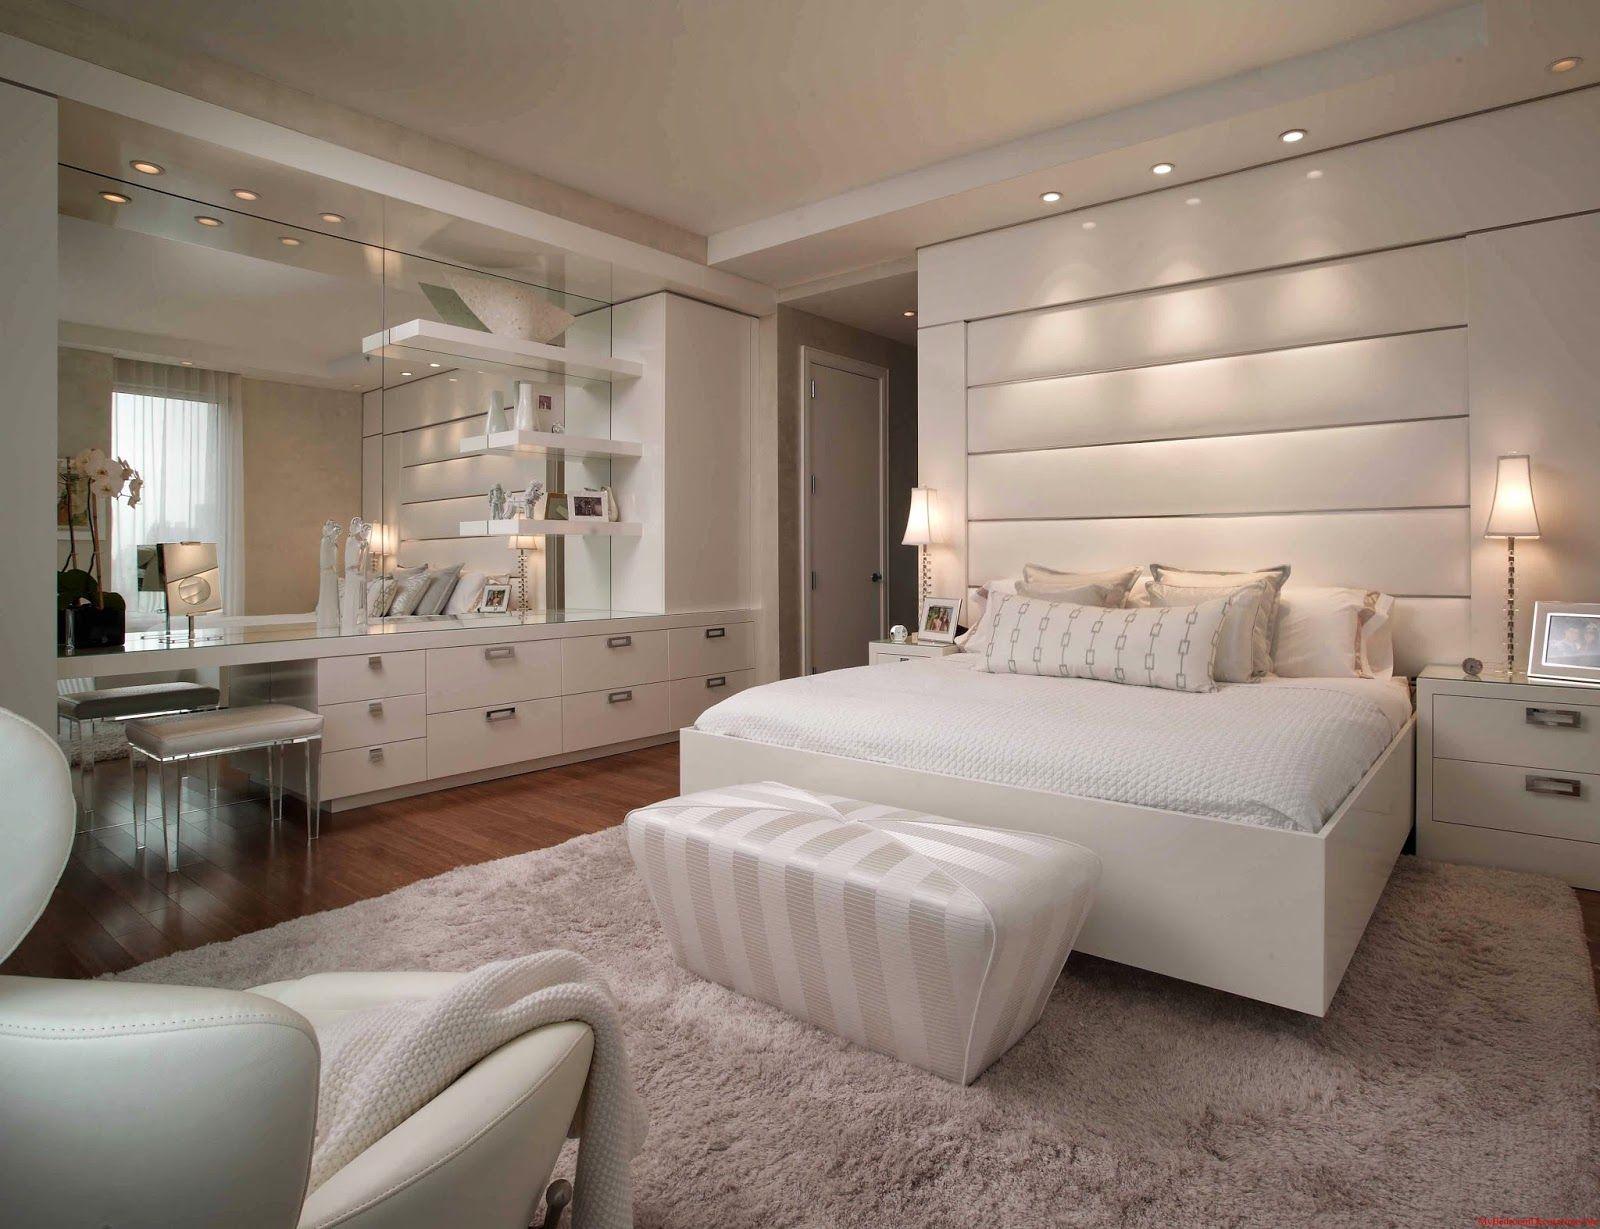 Bedroom Decorating Ideas 2014 White Bedroom Design Master